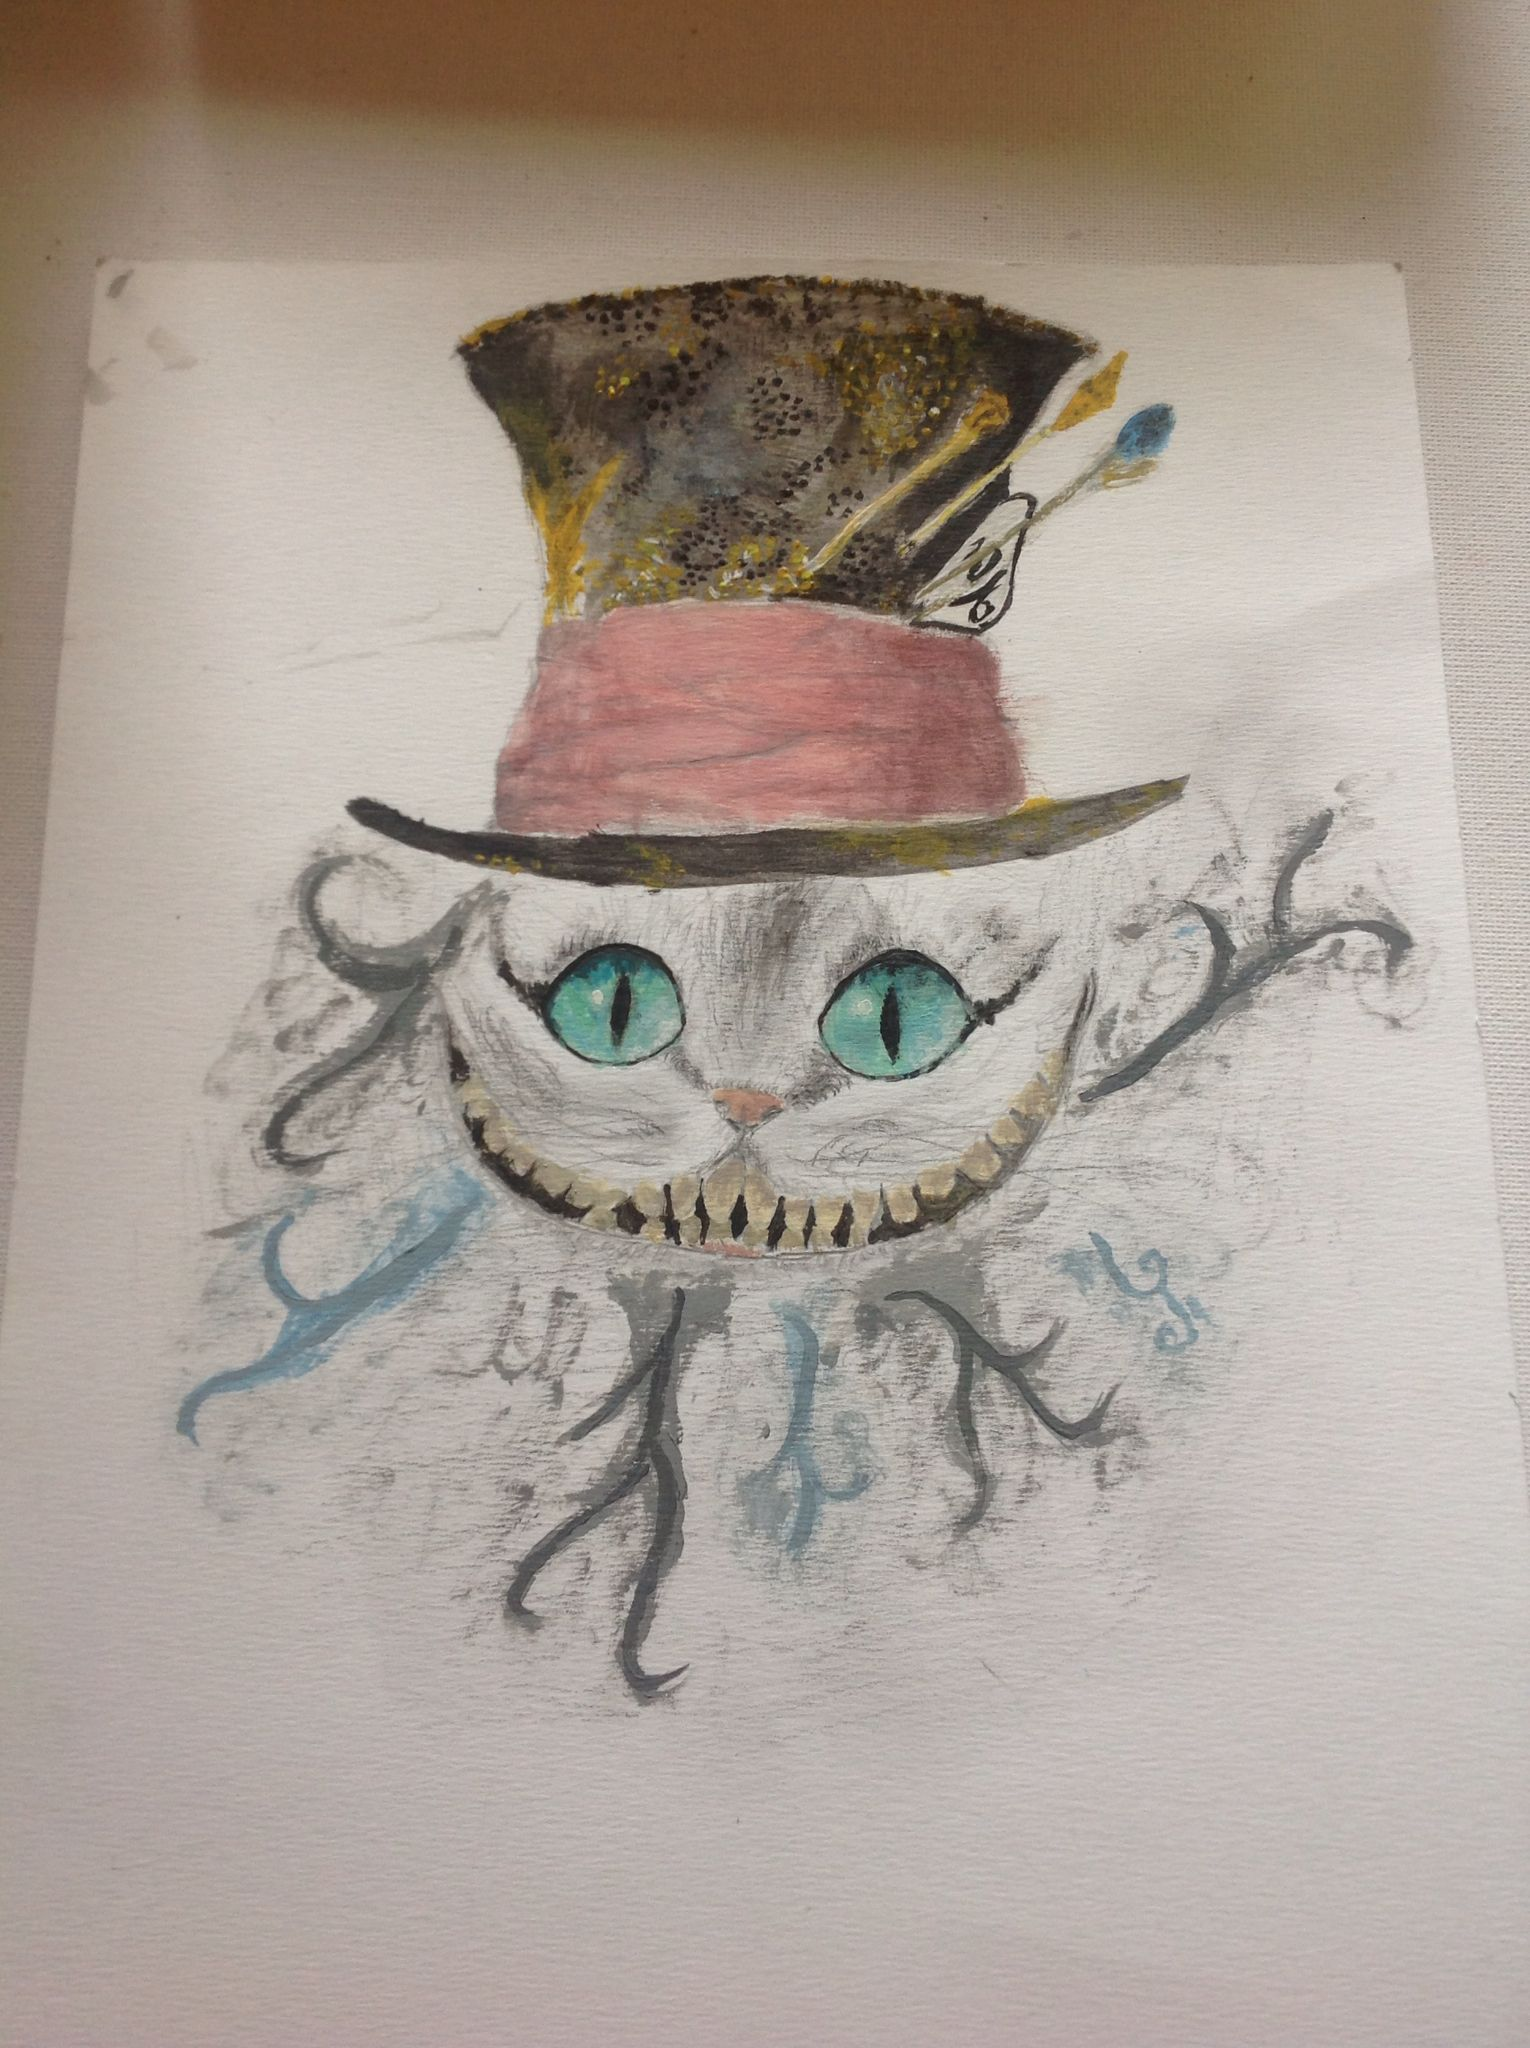 Mad hatter alice in wonderland drawing